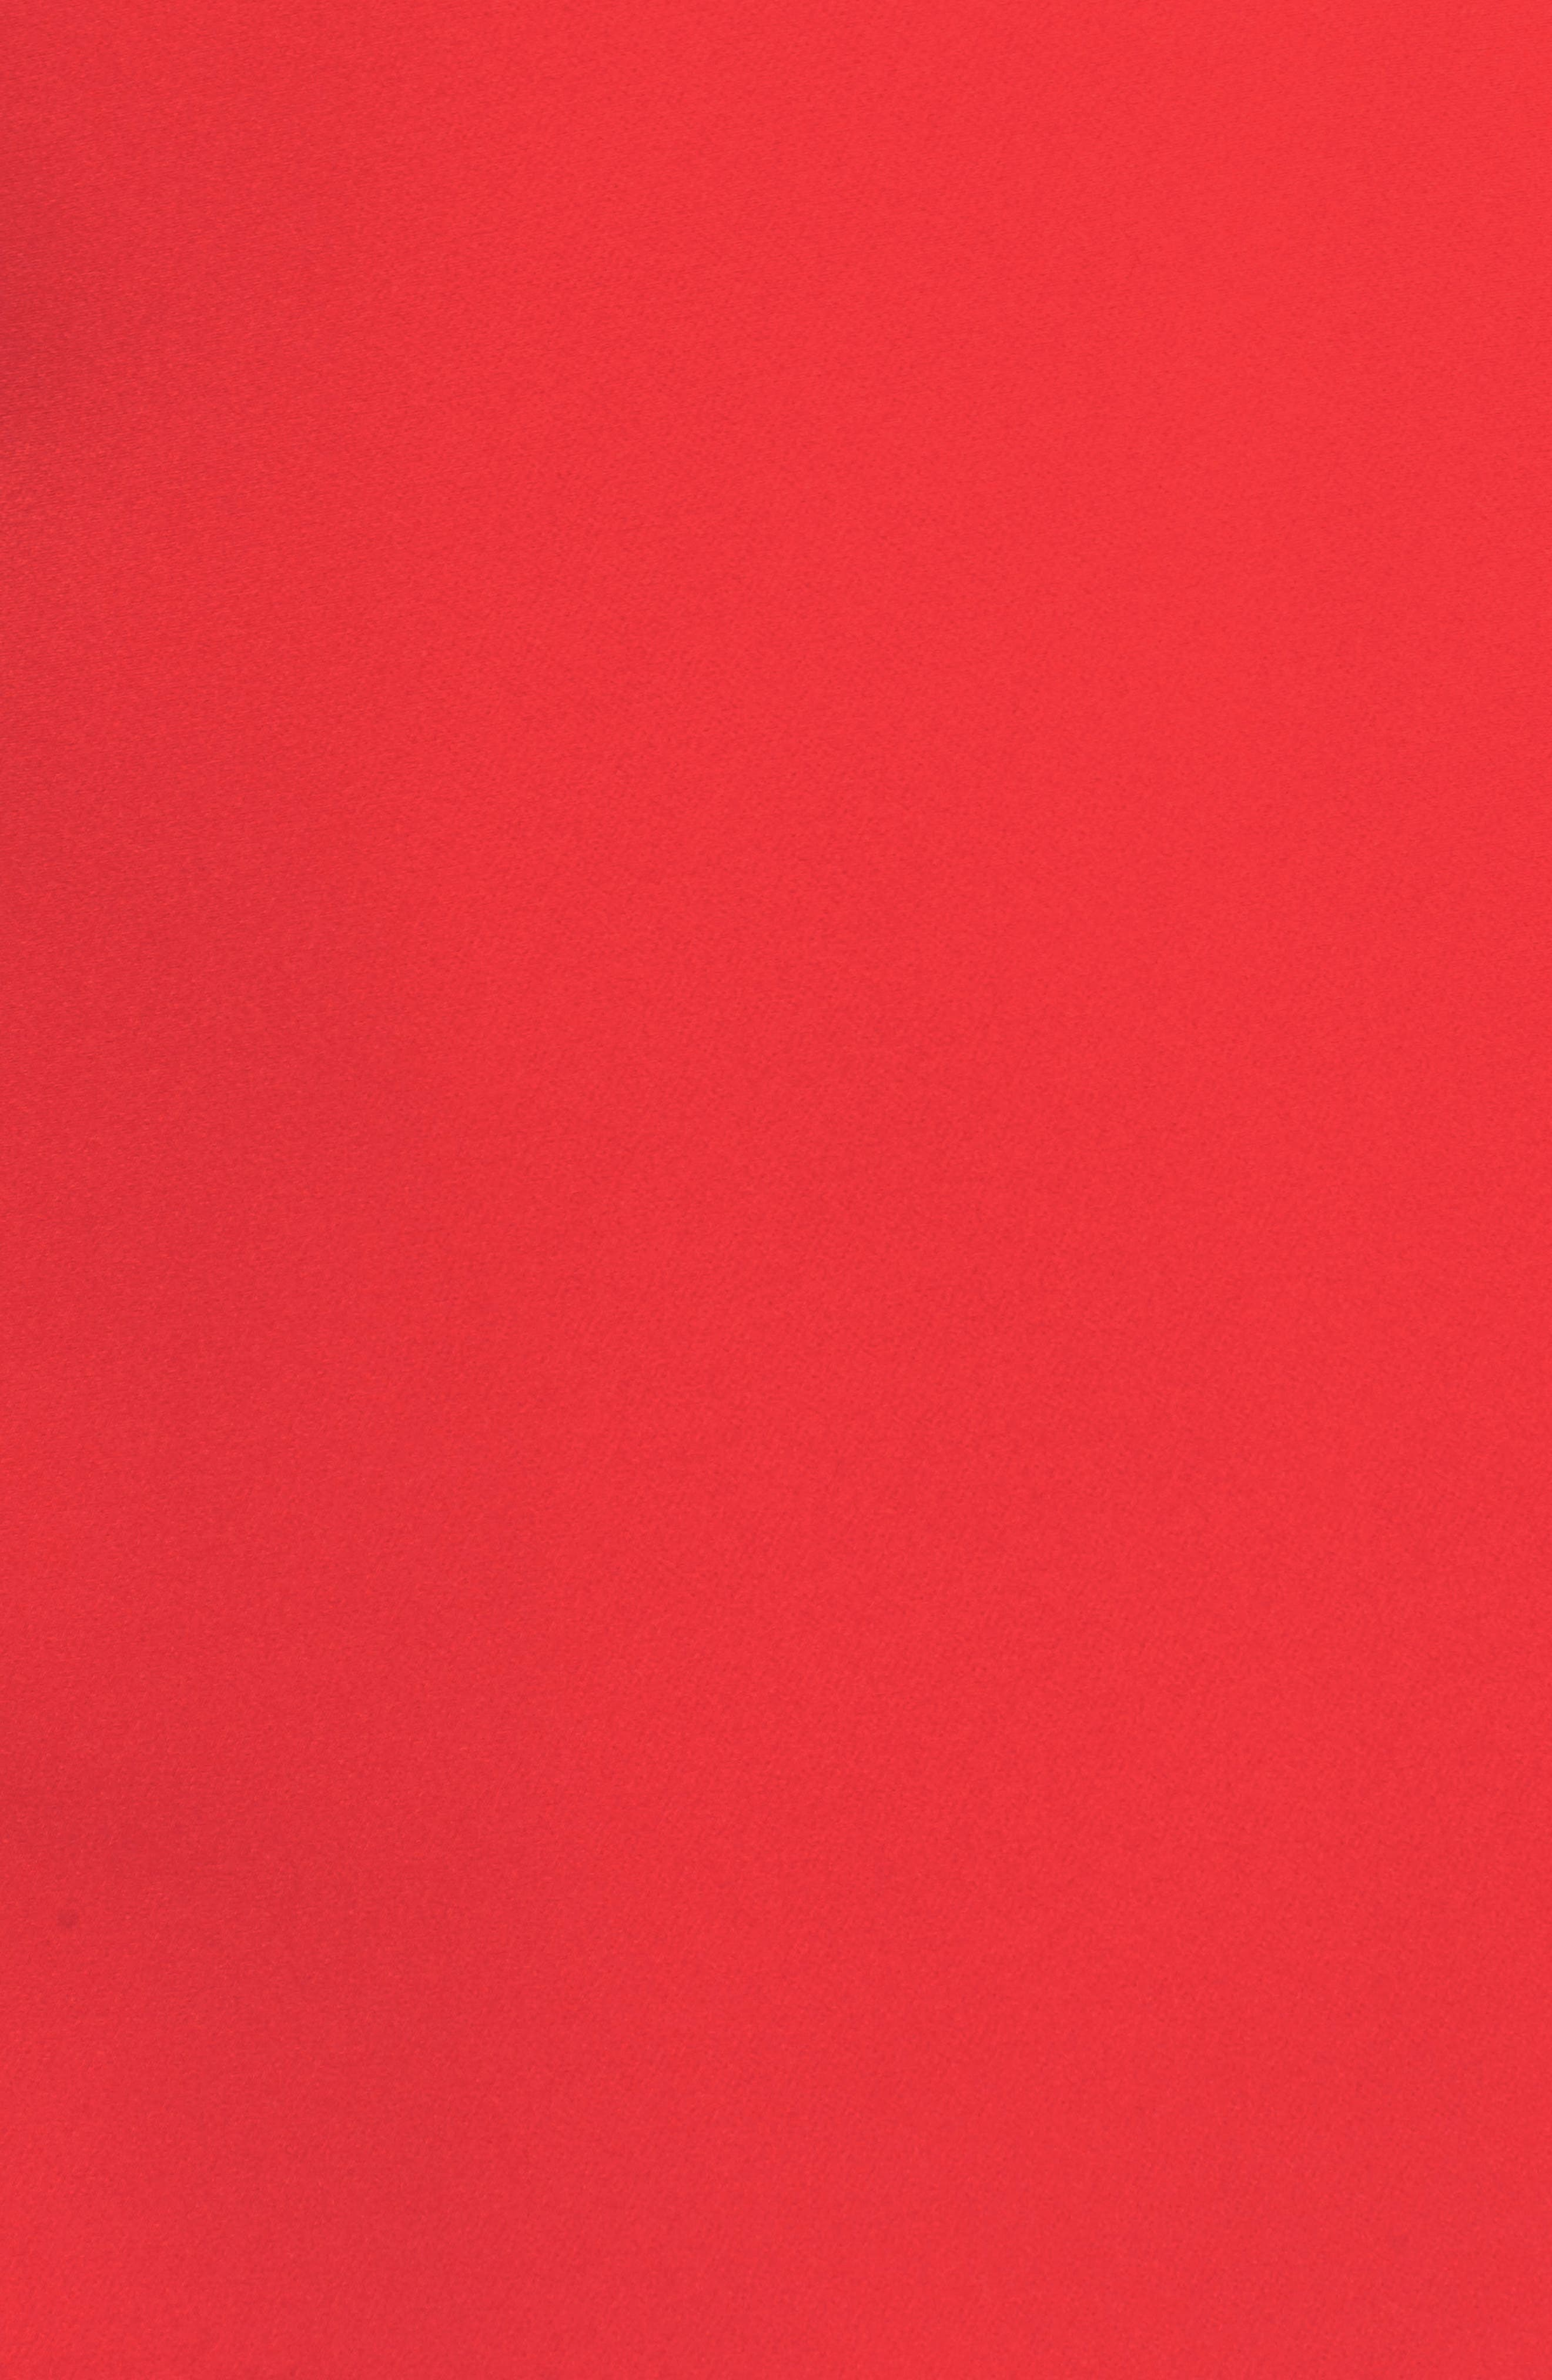 Cape Sleeve Minidress,                             Alternate thumbnail 6, color,                             610